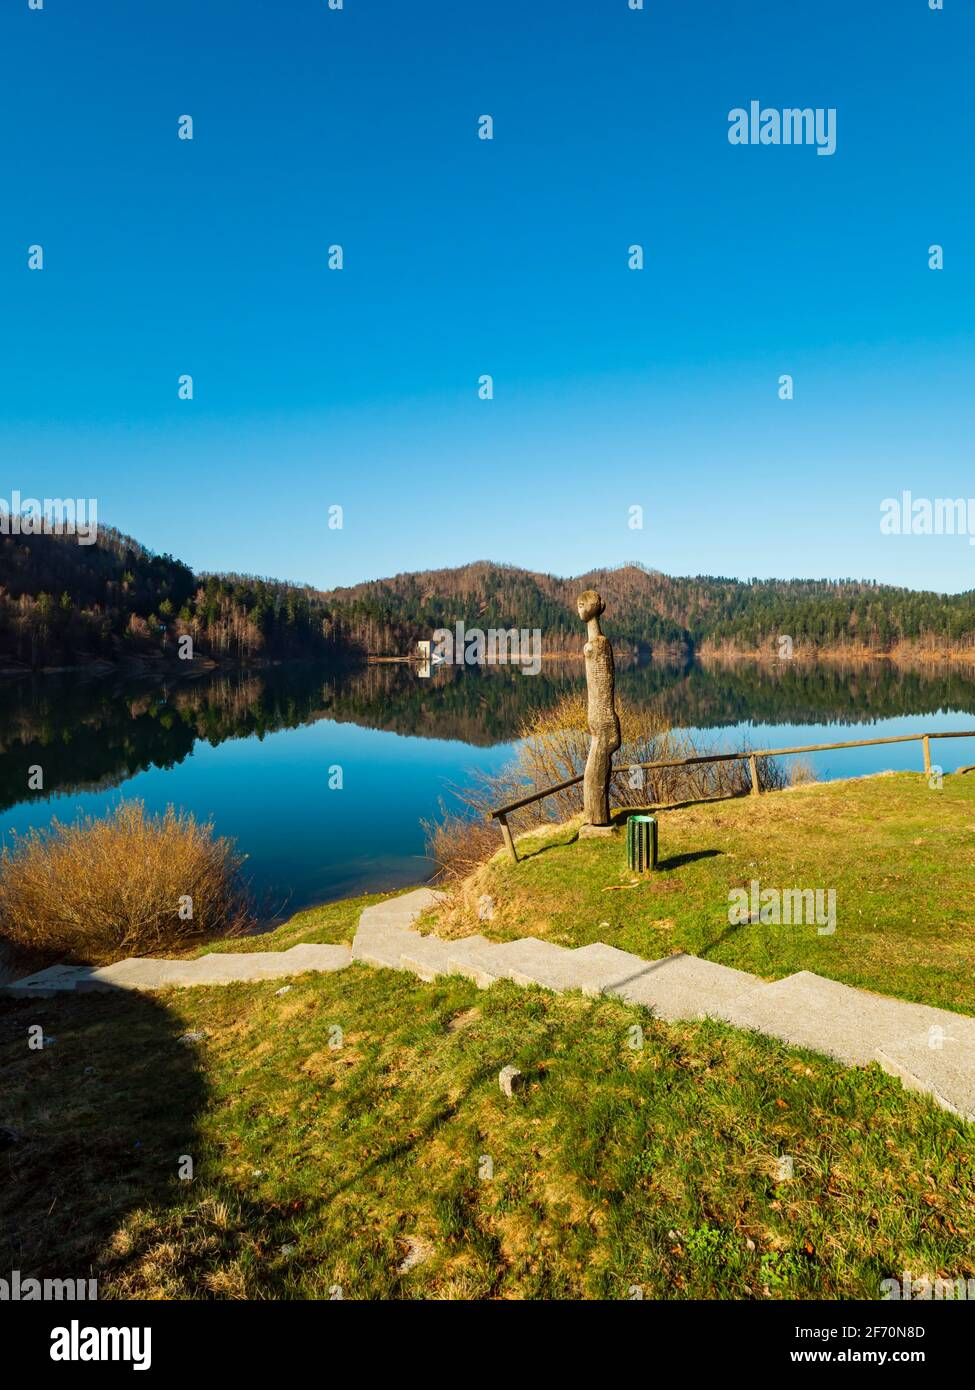 Wooden statue sunshine sunny sunlight Lokve lake in Croatia Europe Stock Photo